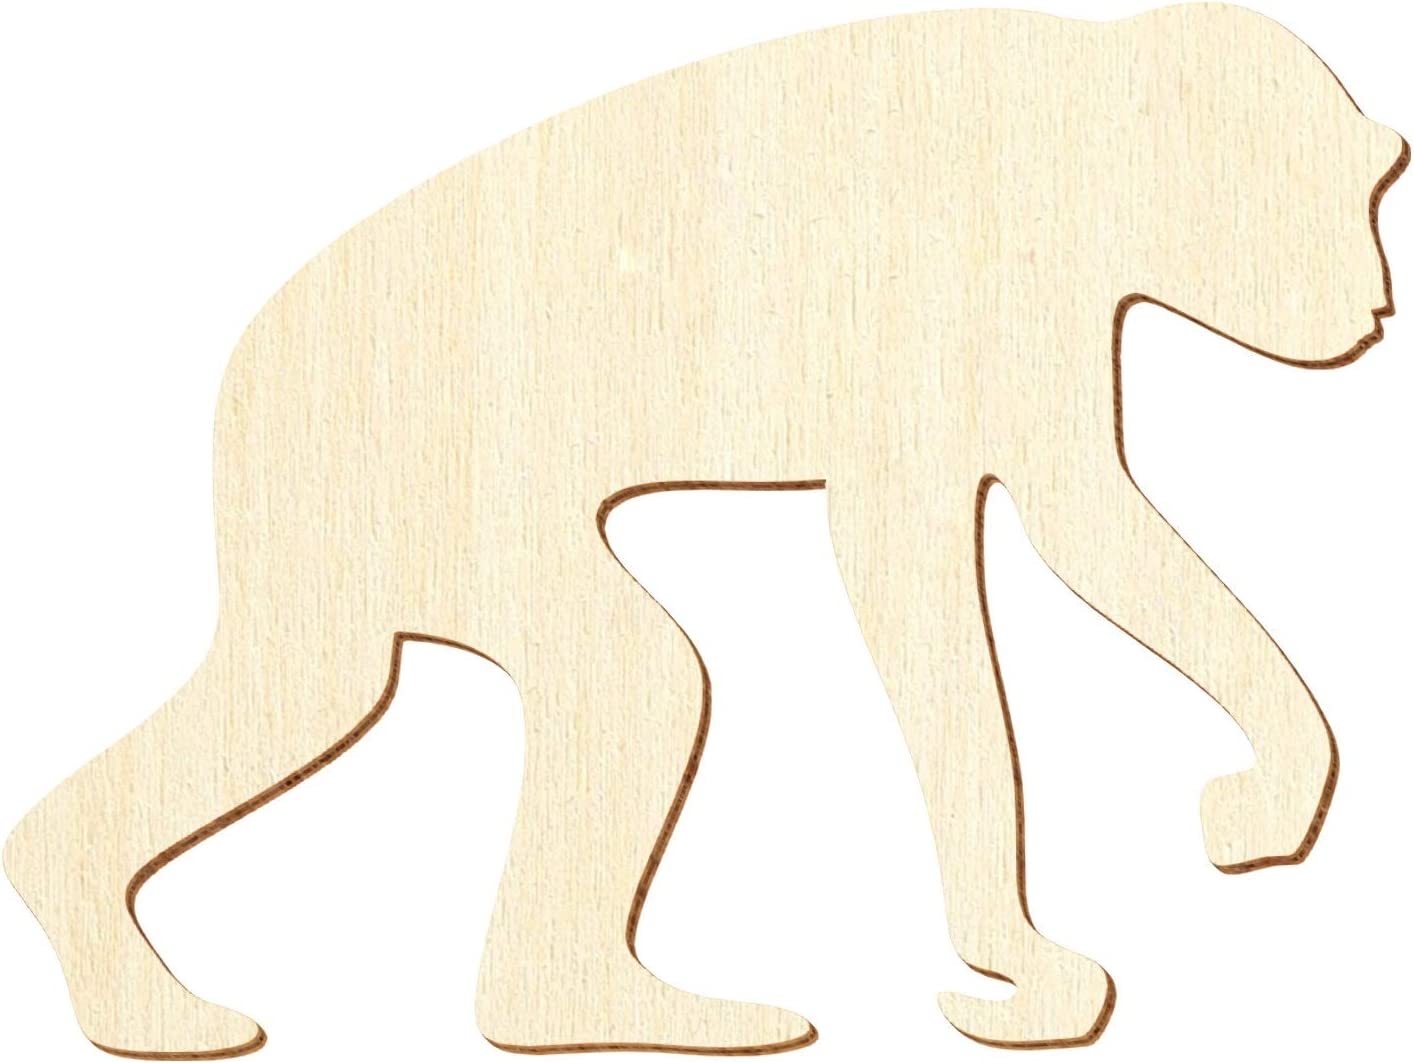 Deko Basteln 3-50cm Gr/ö/ße:3cm Holz Schimpanse Pack mit:1 St/ück